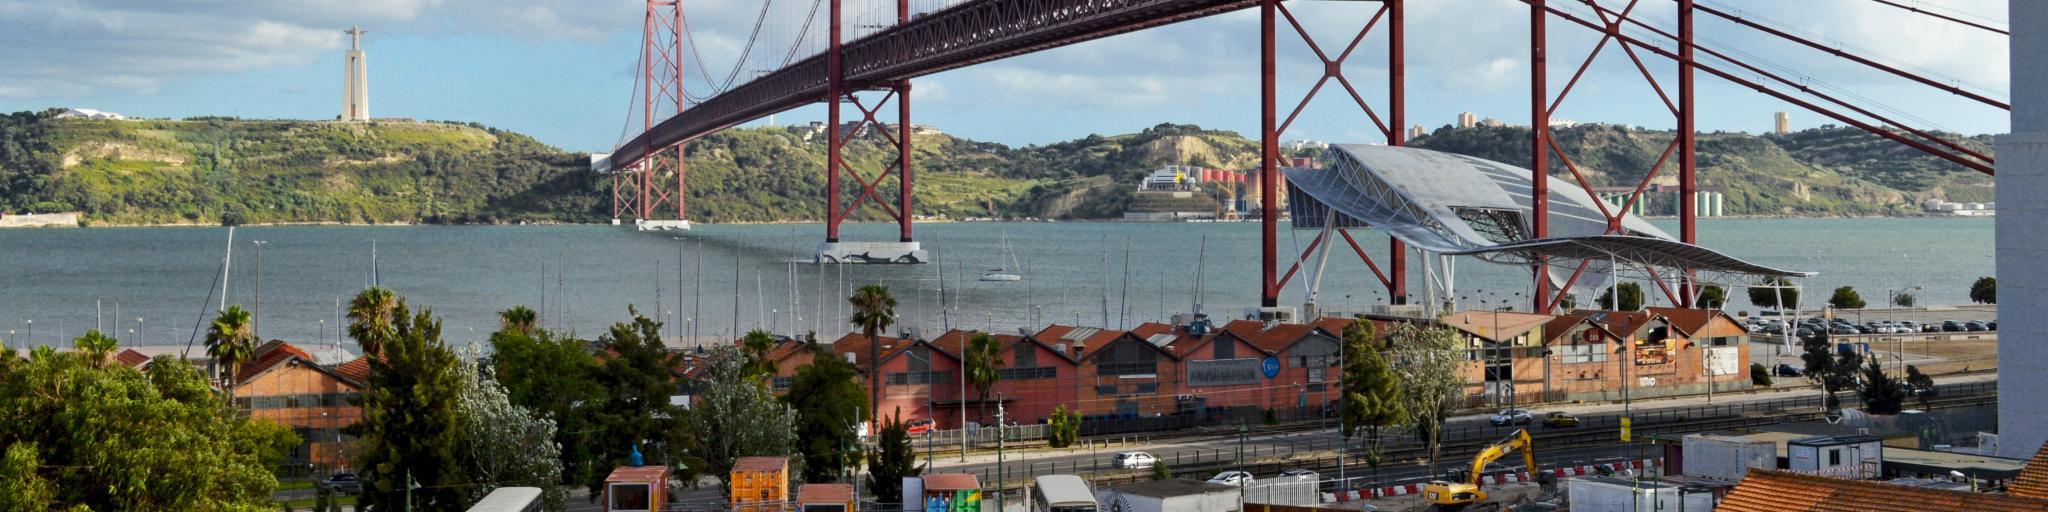 LX Factory under Ponte 25 de Abril suspension bridge